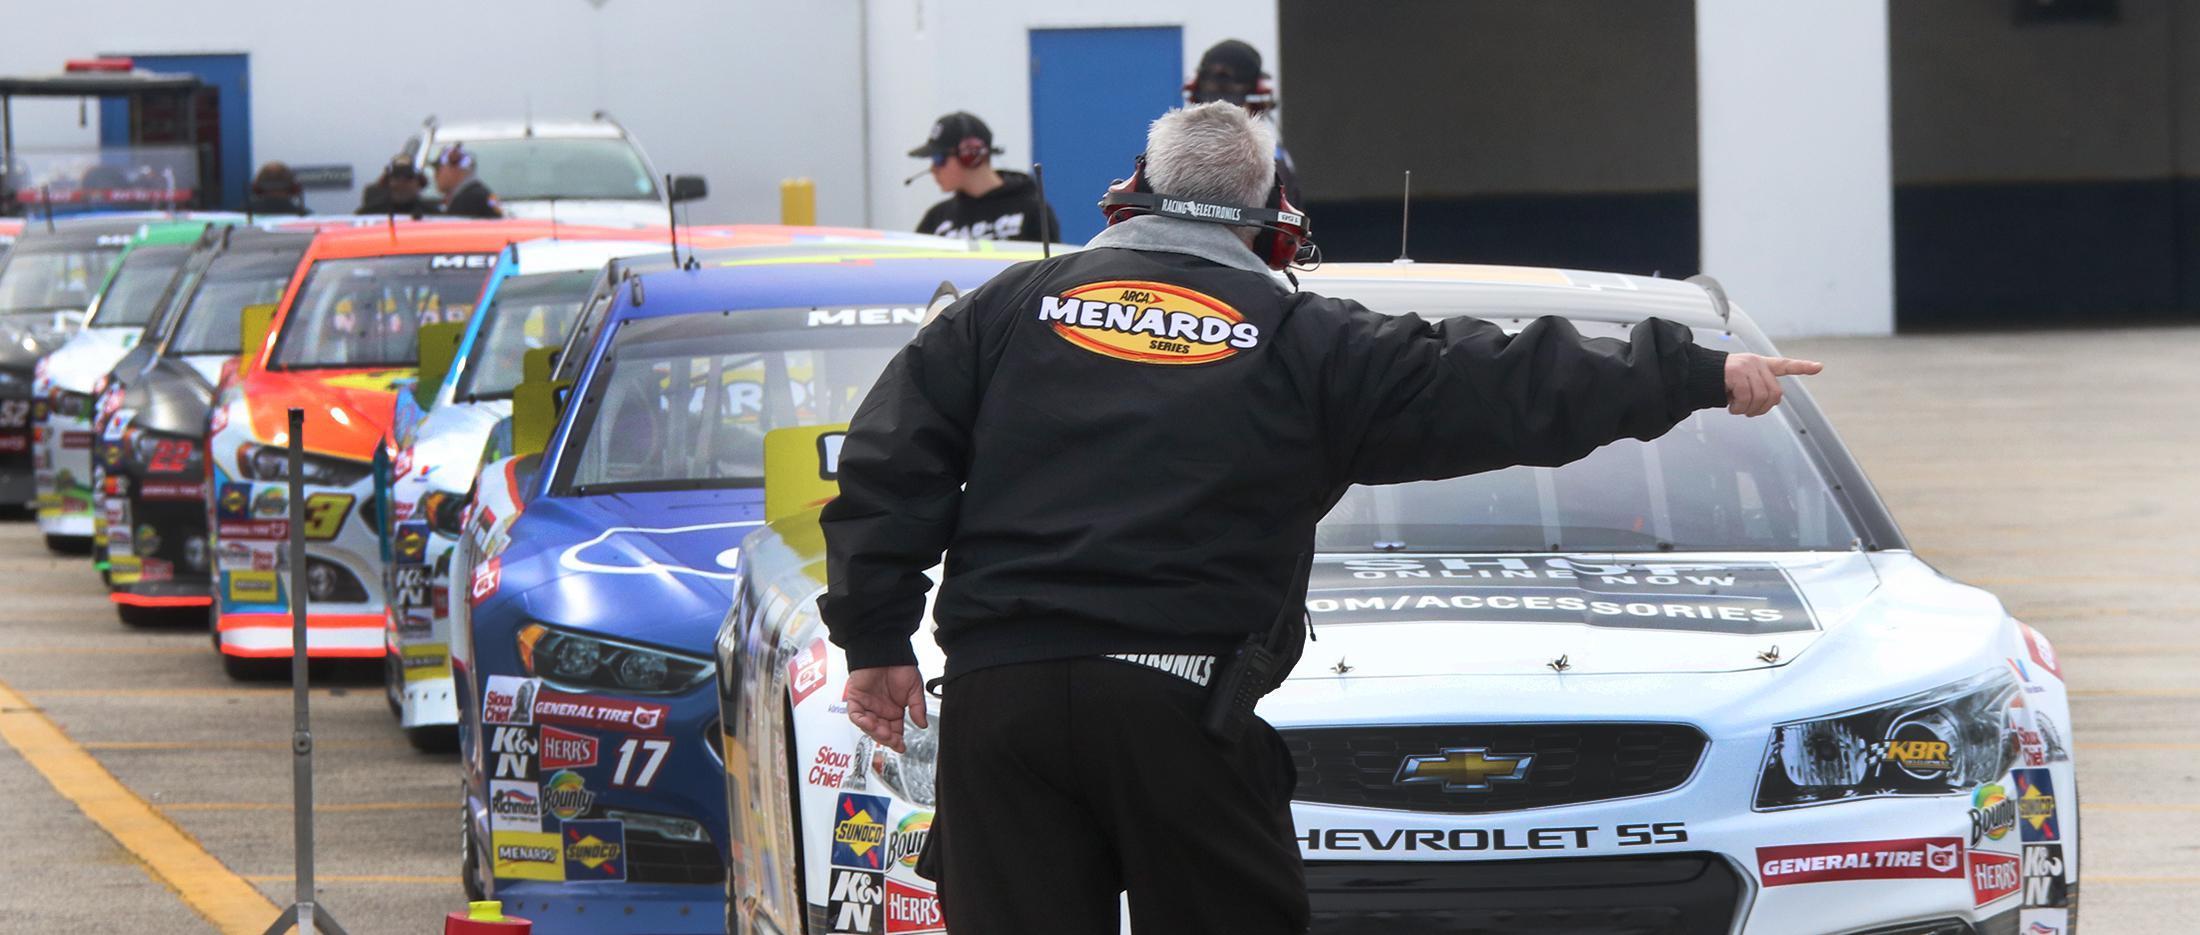 At Daytona, ARCA breaks the winter quiet with NASCAR on deck – Daytona Beach News-Journal